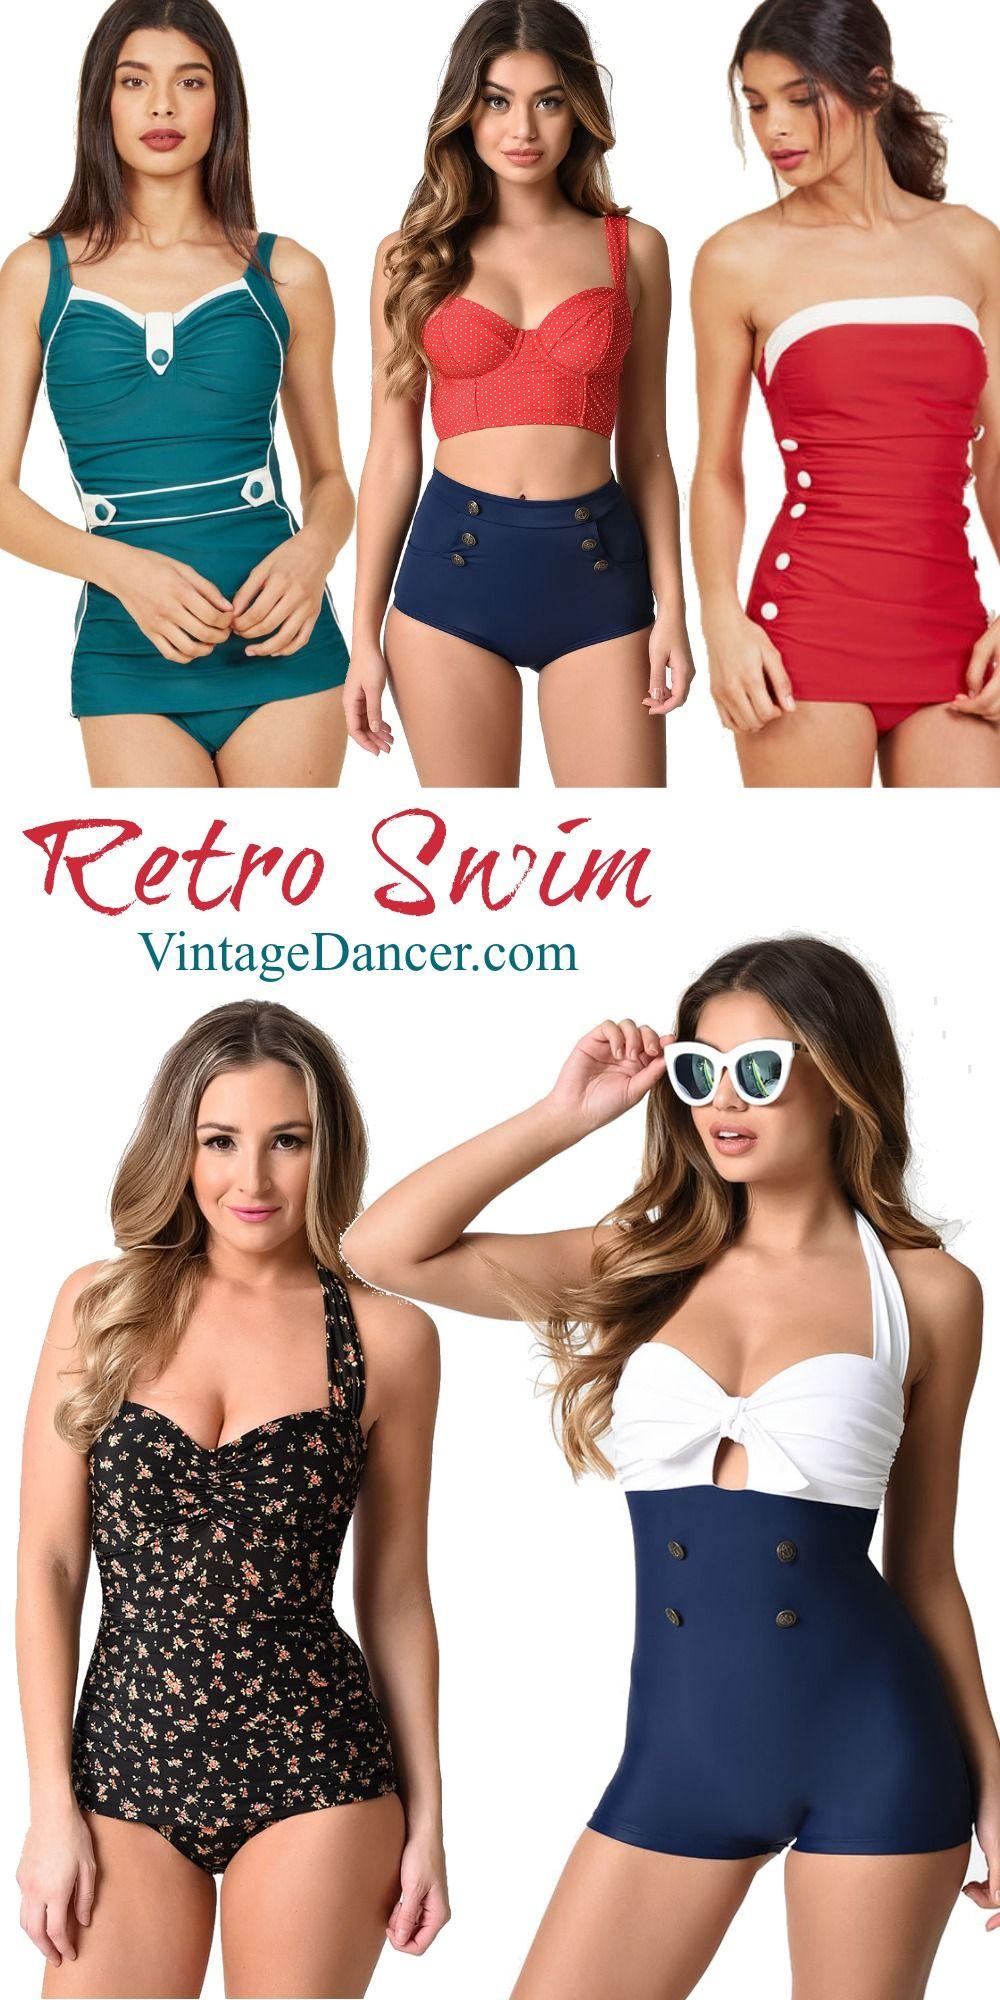 dd0f5f84cf1f1 New Vintage Retro Swimsuits